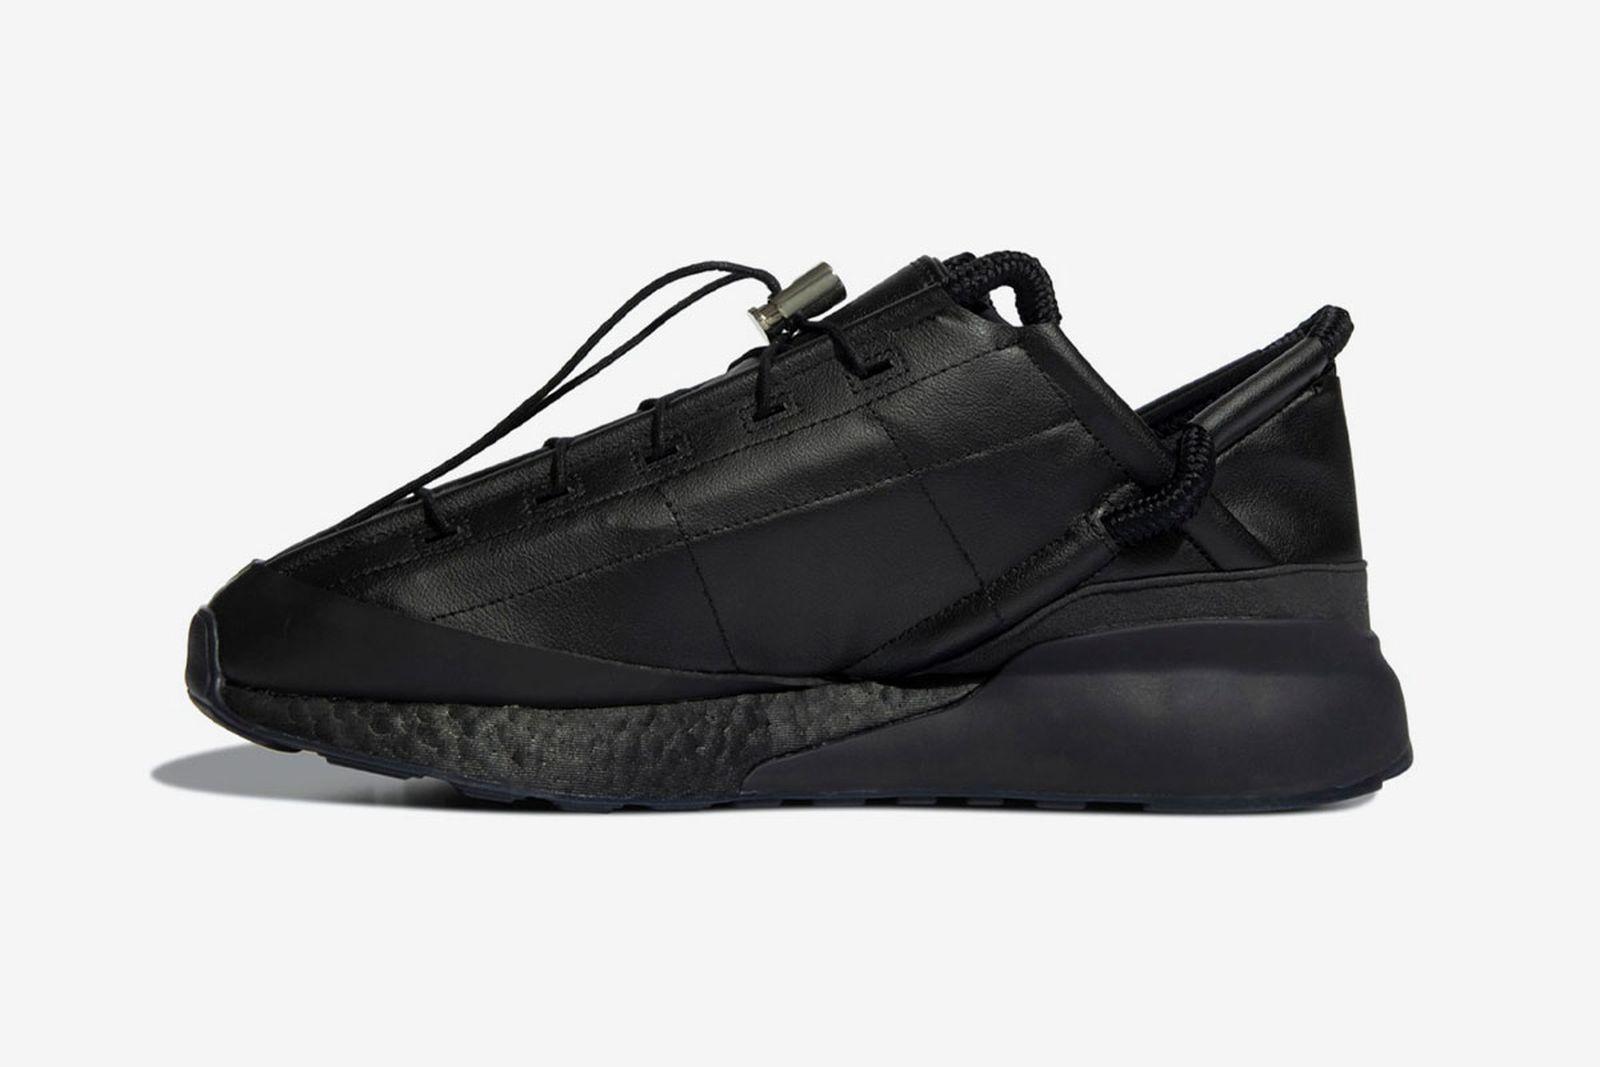 craig-green-adidas-zx-2k-phormar-ii-release-date-price-06